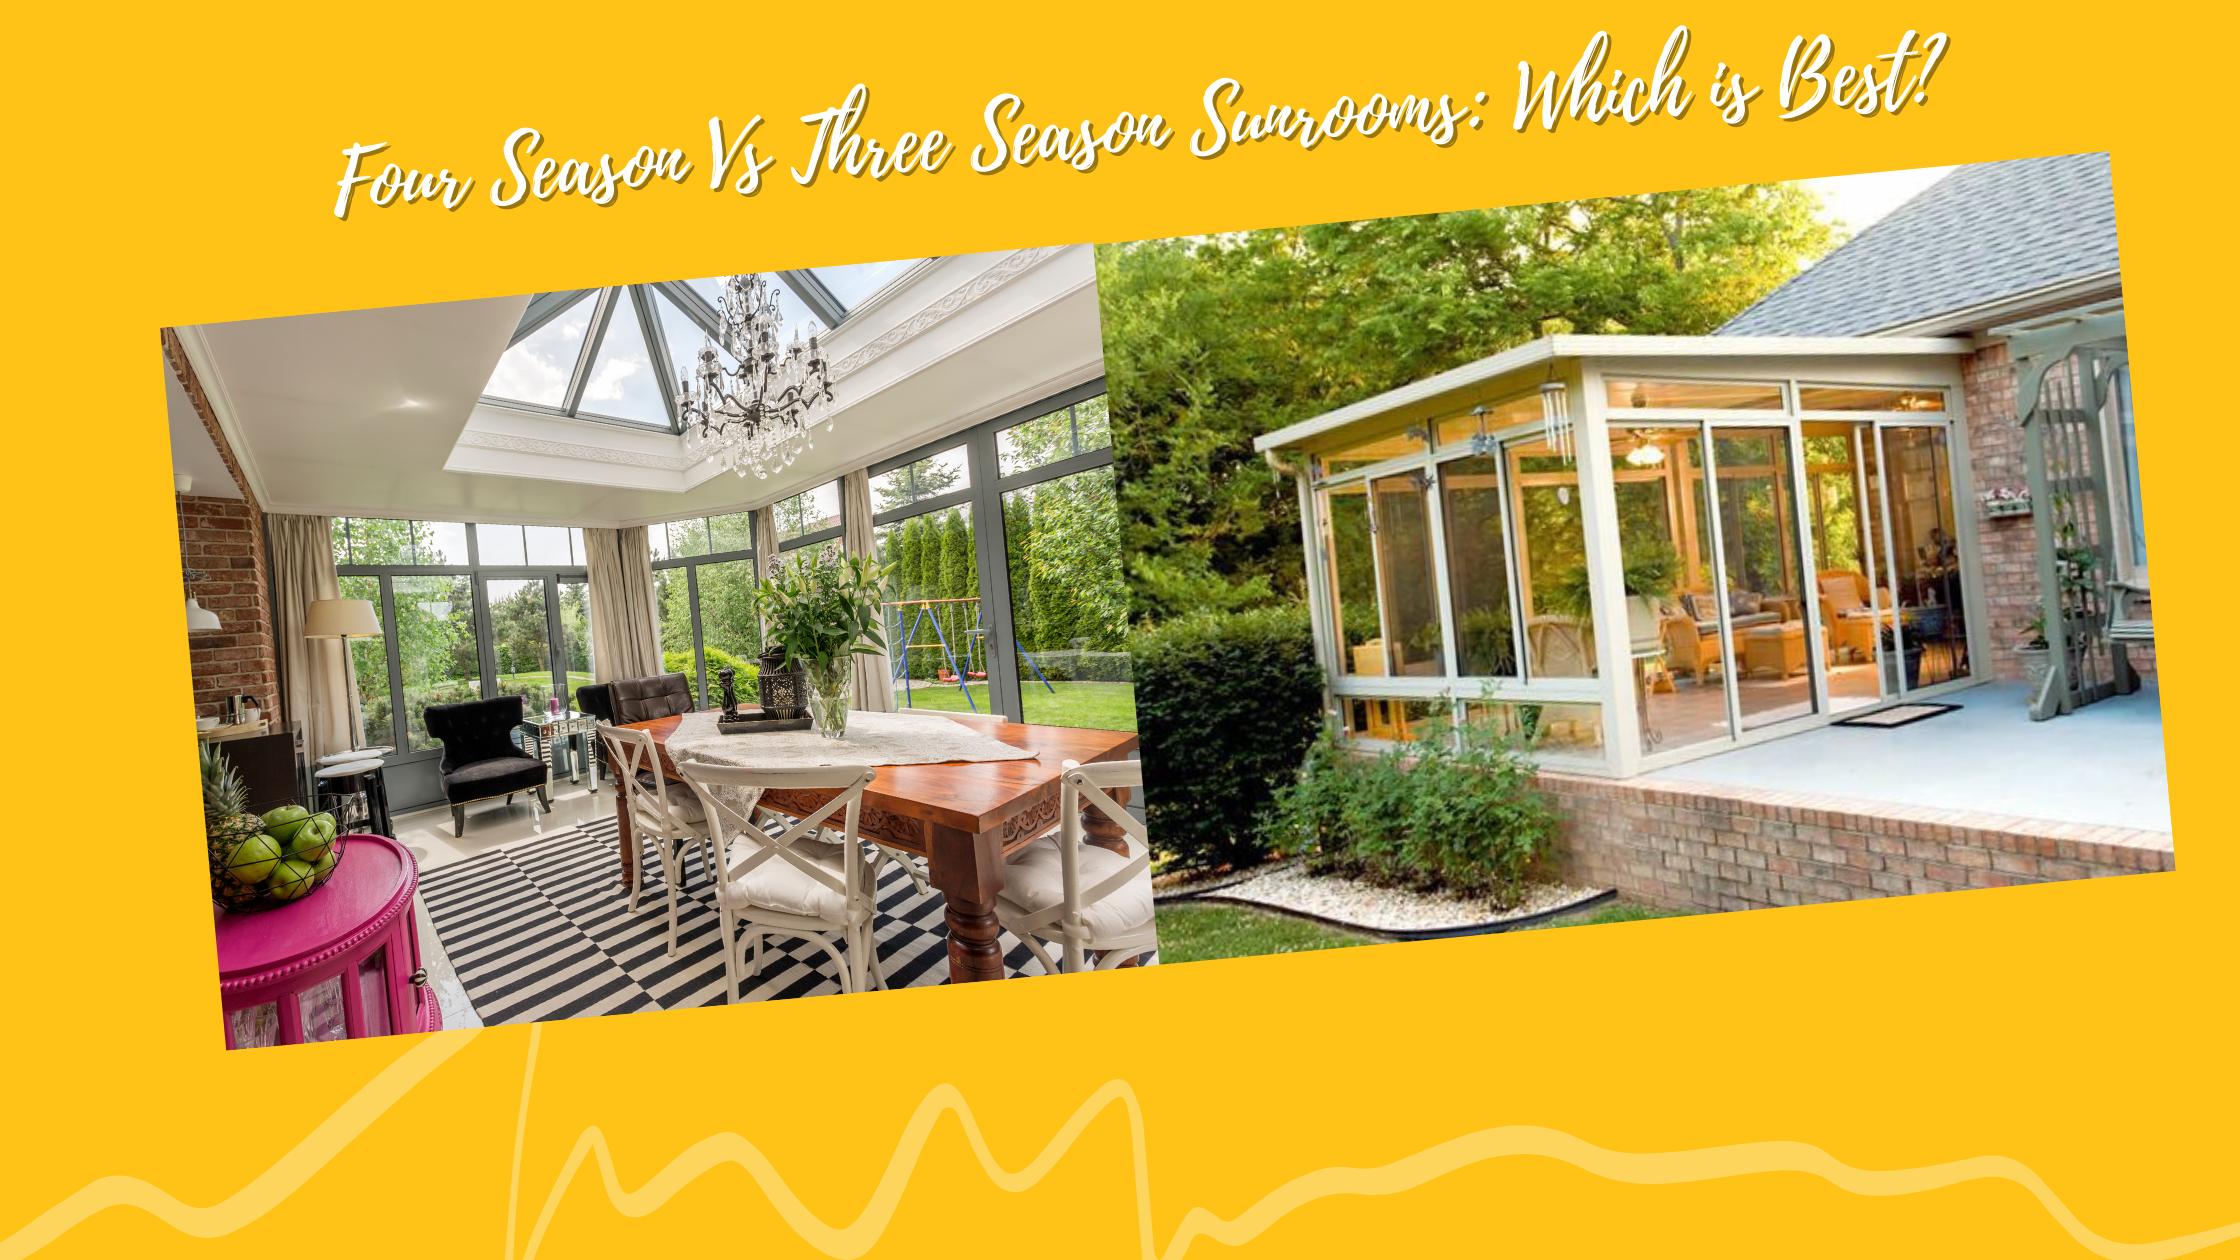 Four Season Vs Three Season Sunrooms: Which is Best?